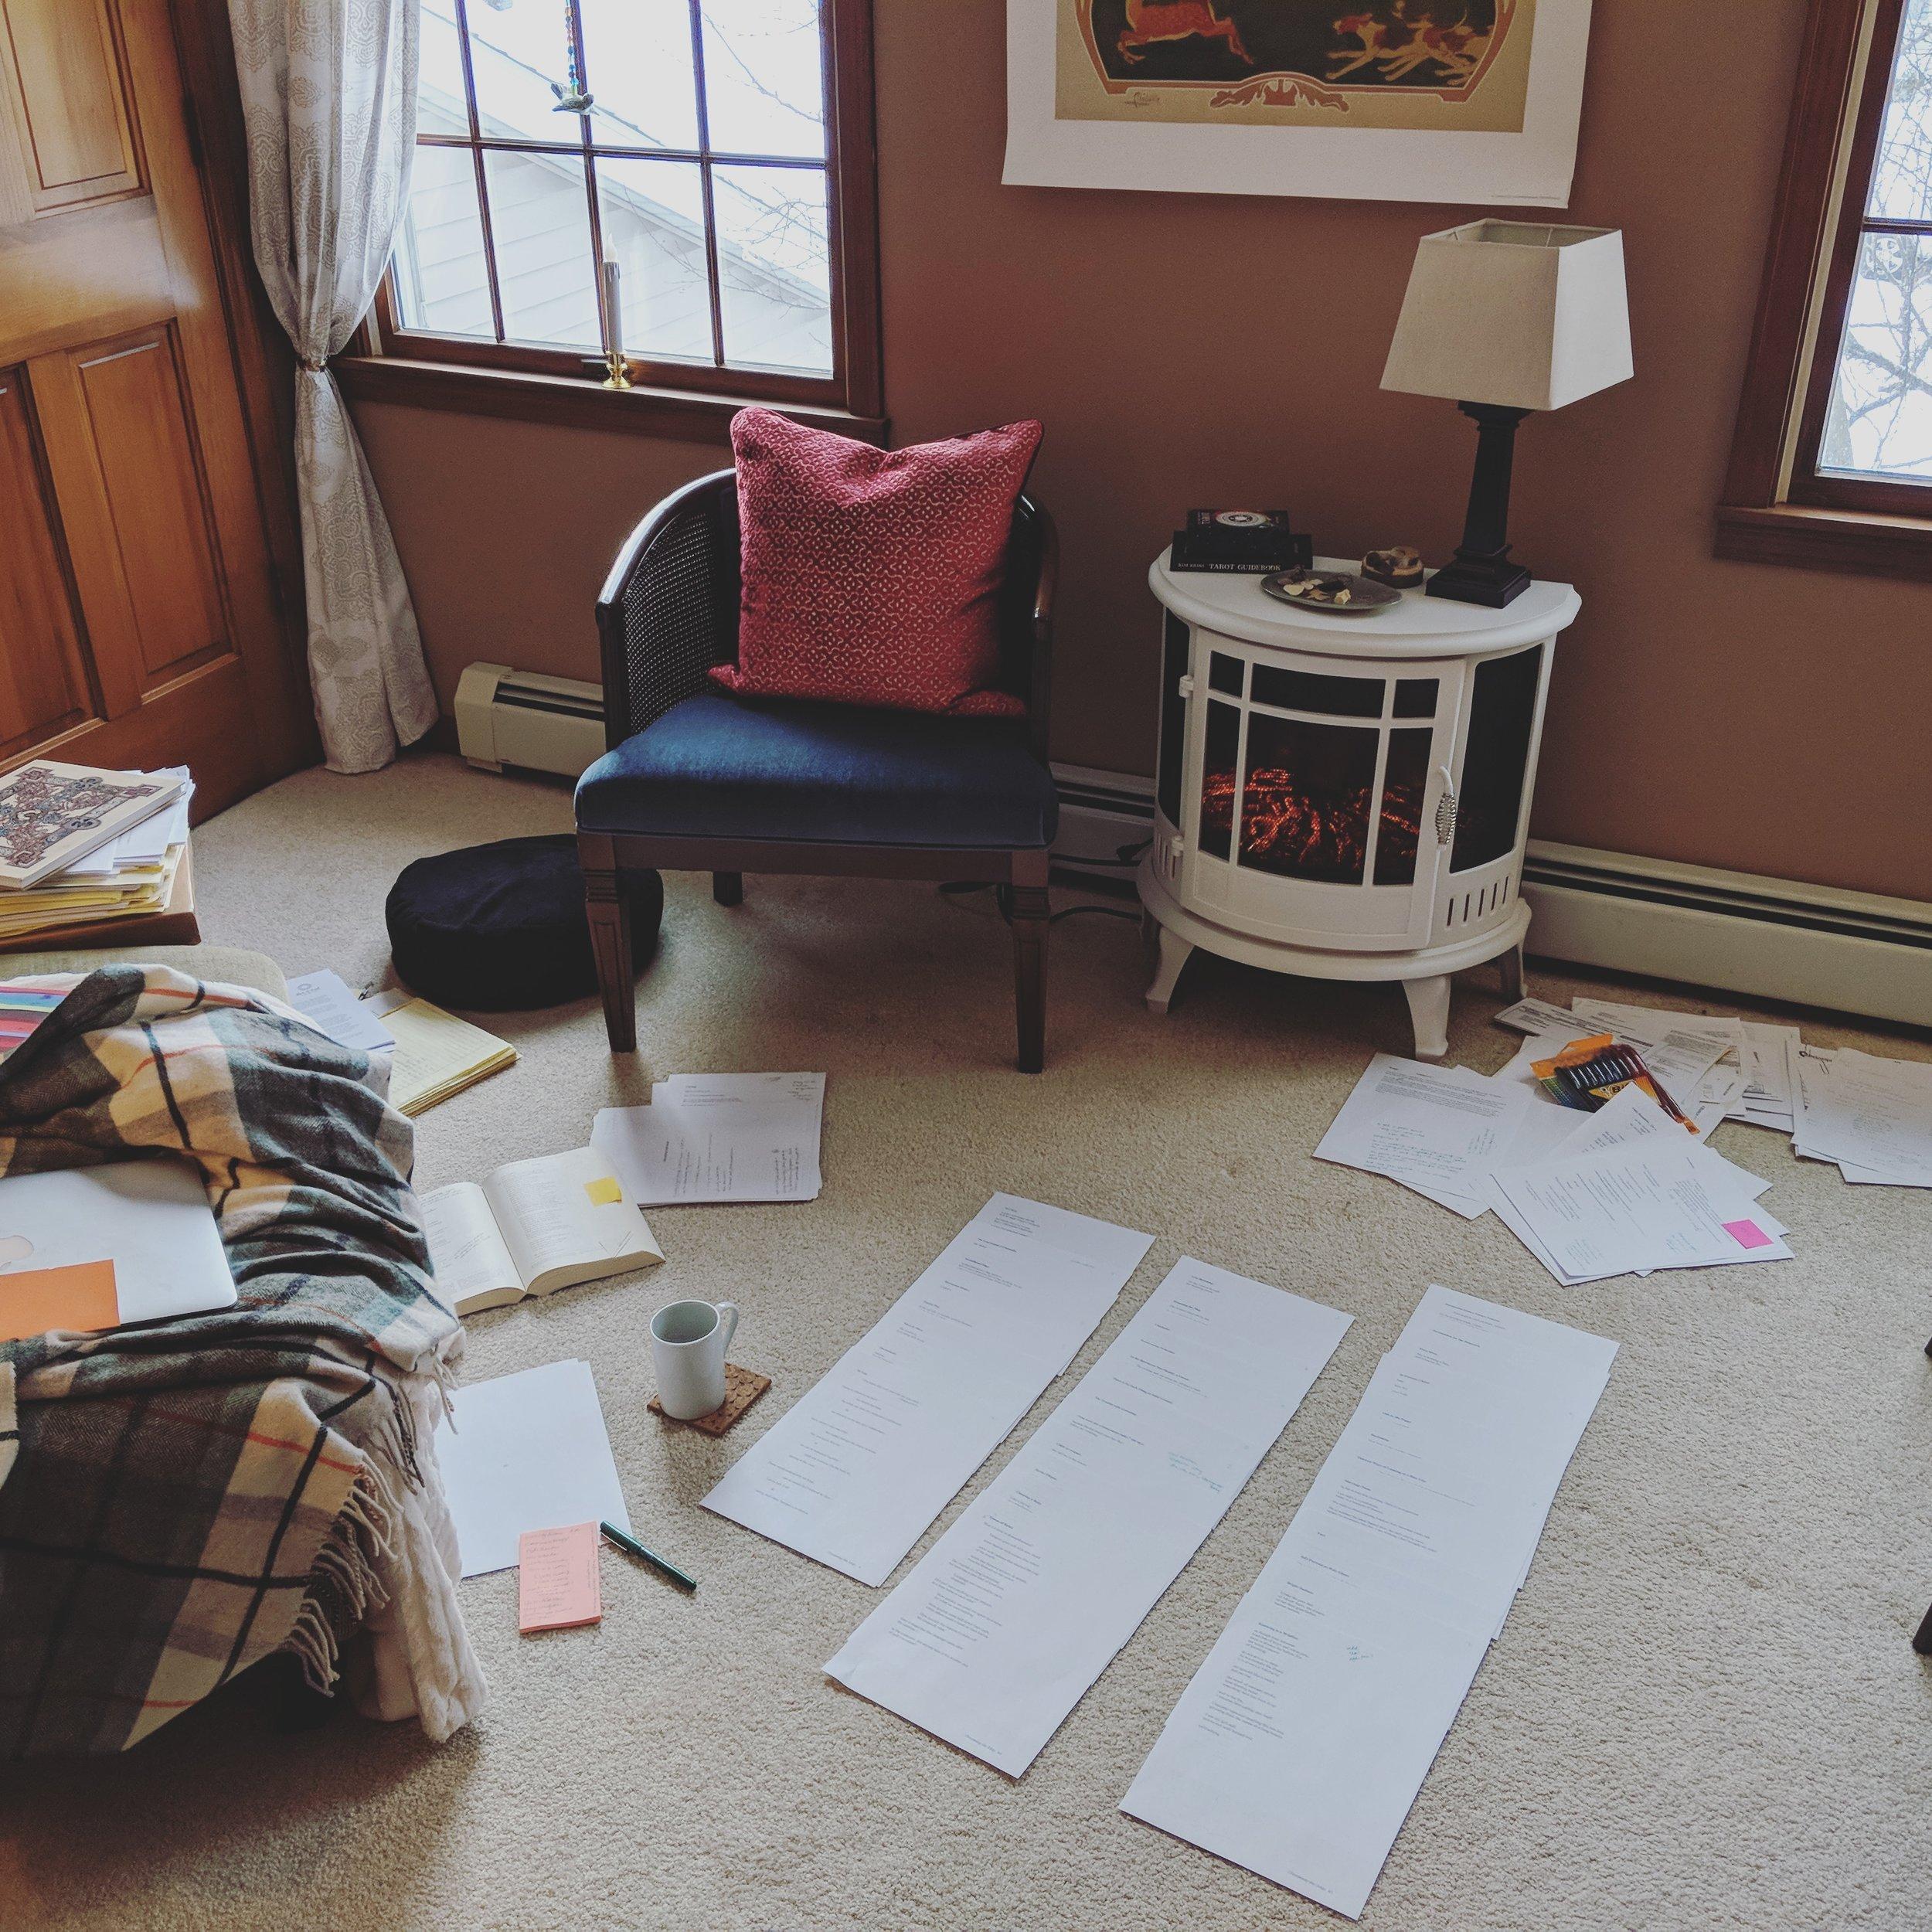 Emily-Stoddard-Poetry-Revision-Practice.jpg